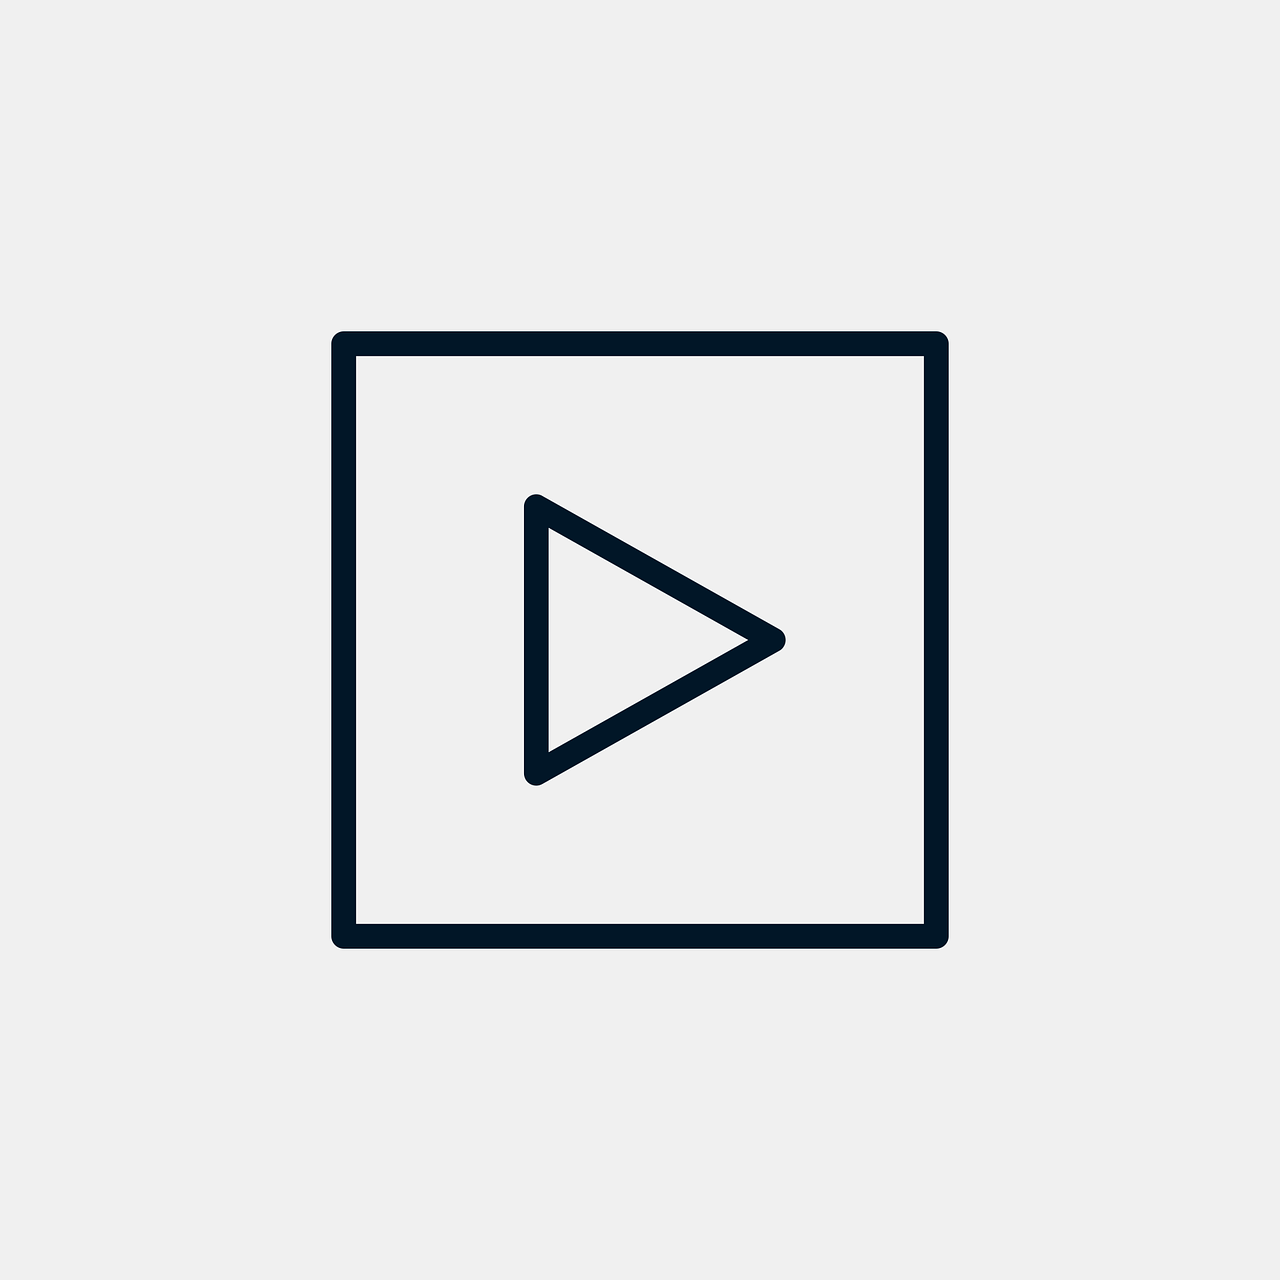 Video,media,youtube,icon,movie - free image from needpix.com